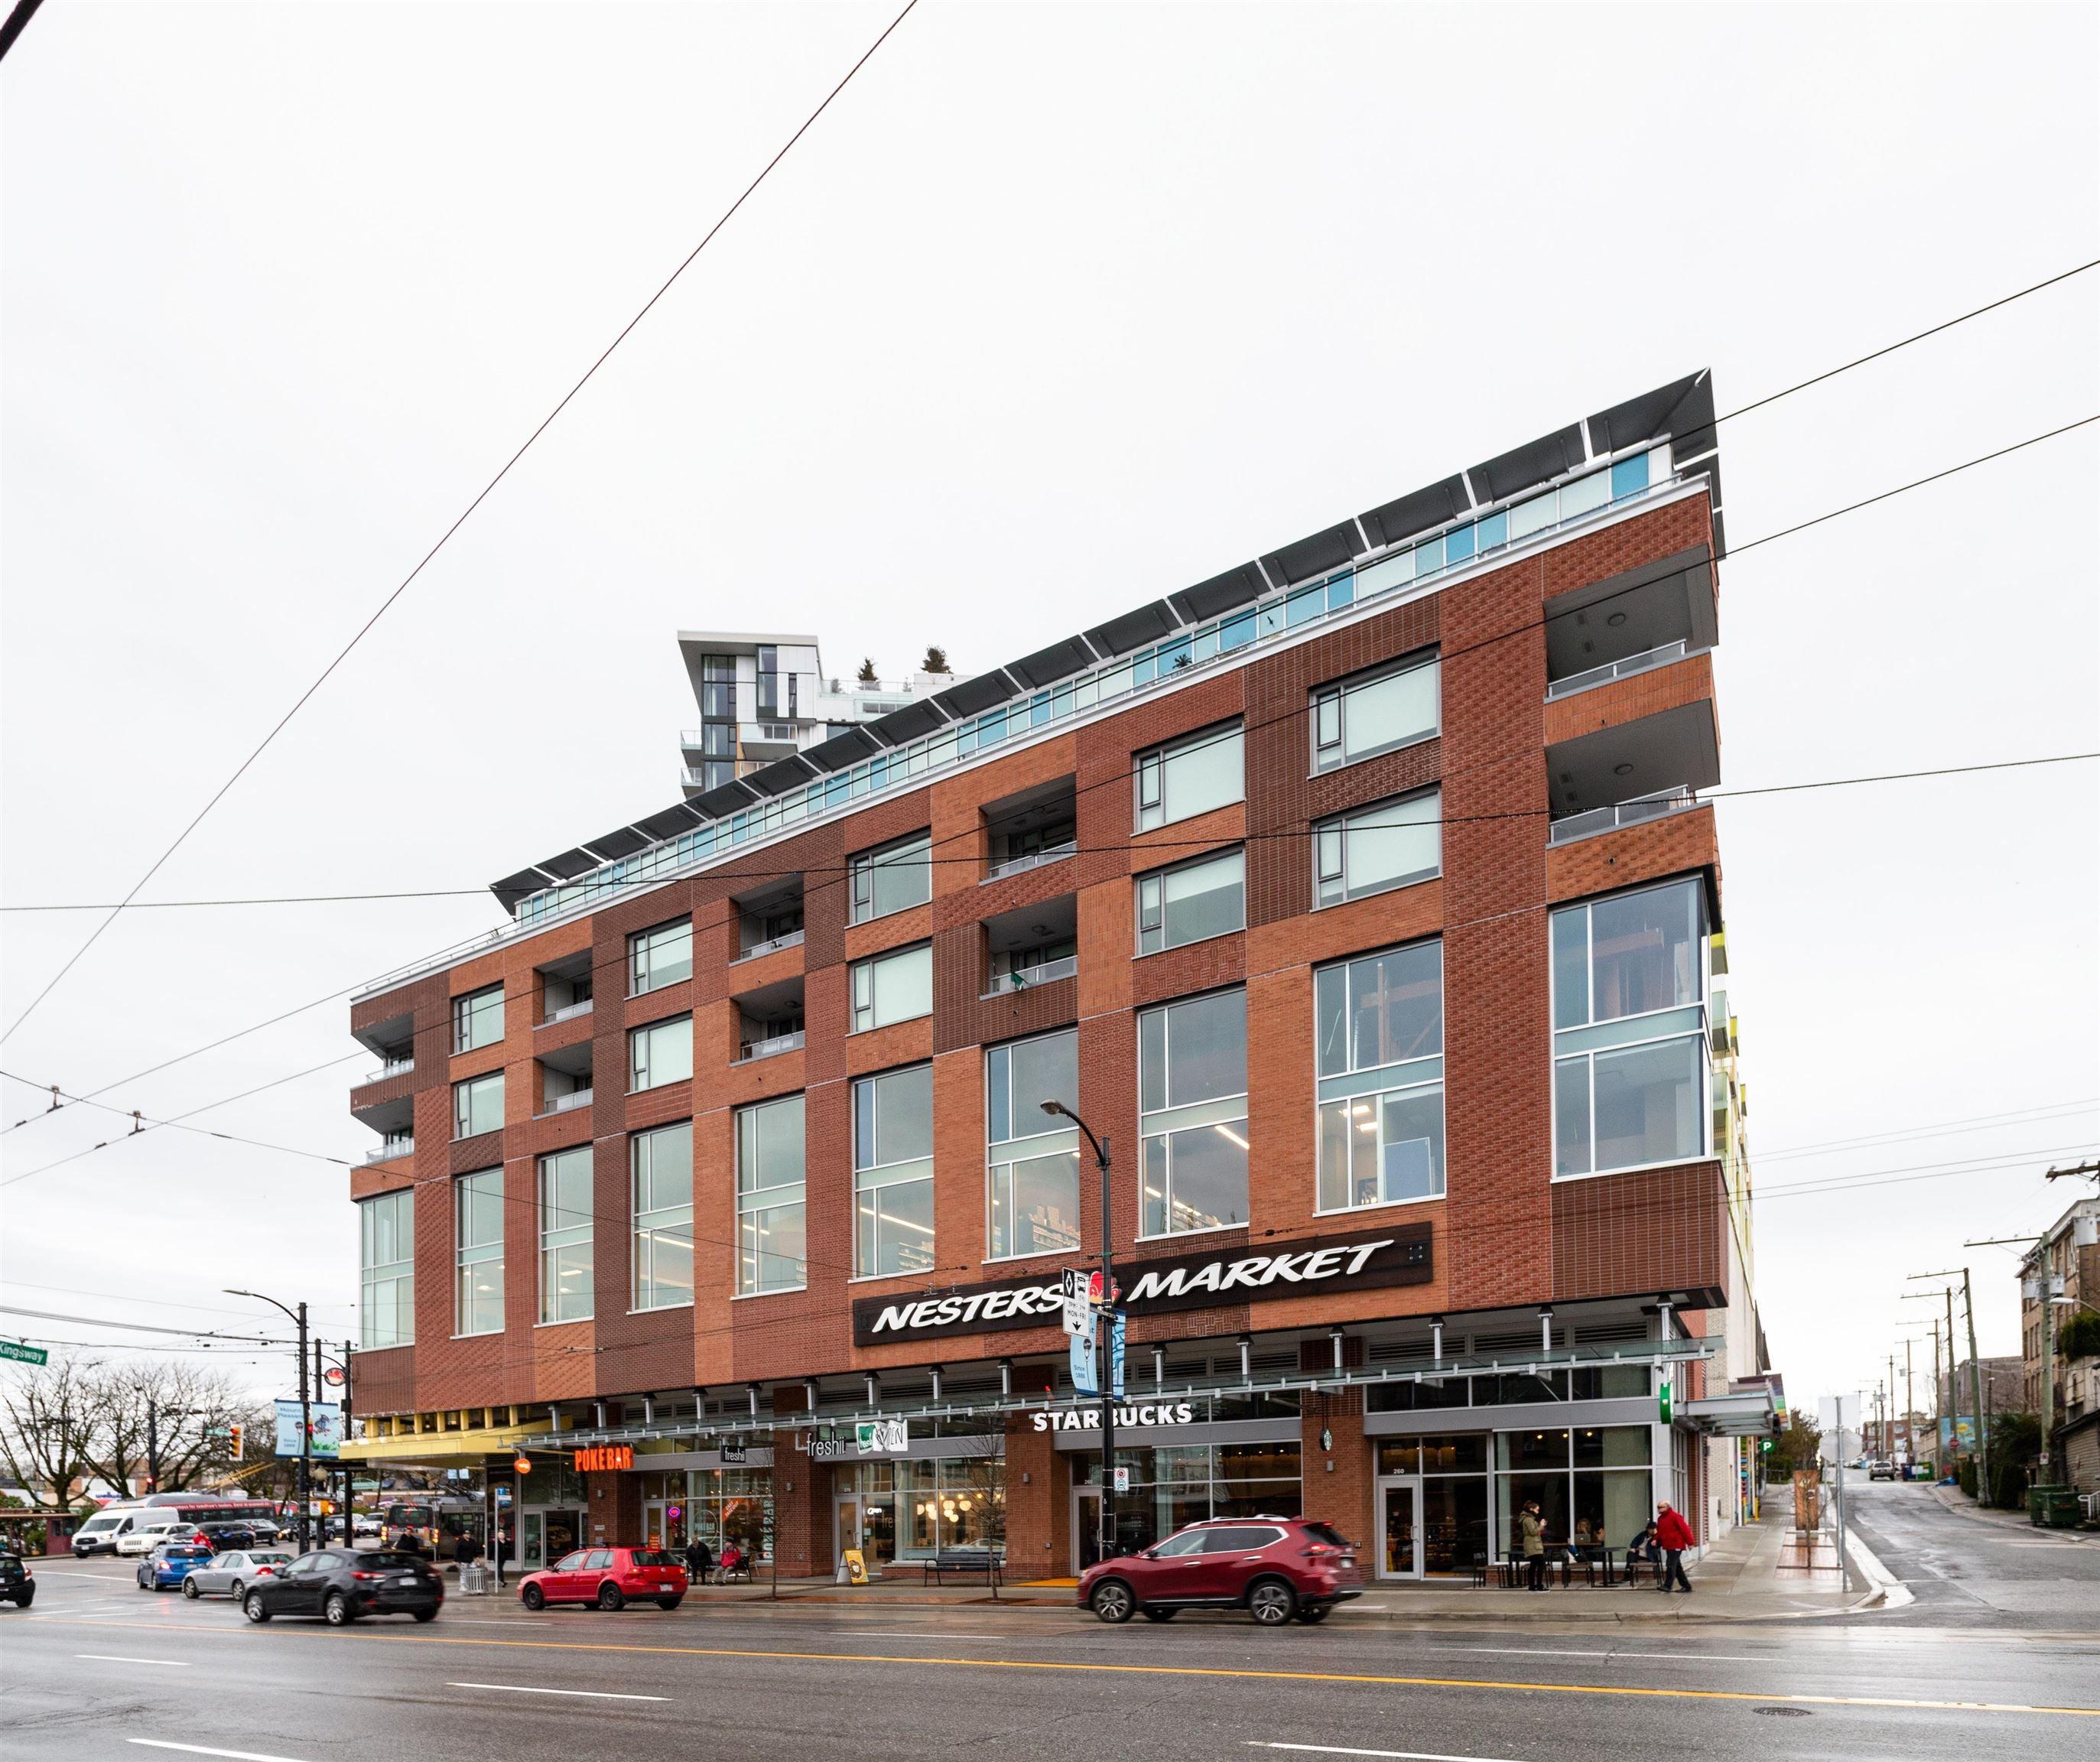 523 2508 WATSON STREET - Mount Pleasant VE Townhouse for sale, 3 Bedrooms (R2625701) - #34